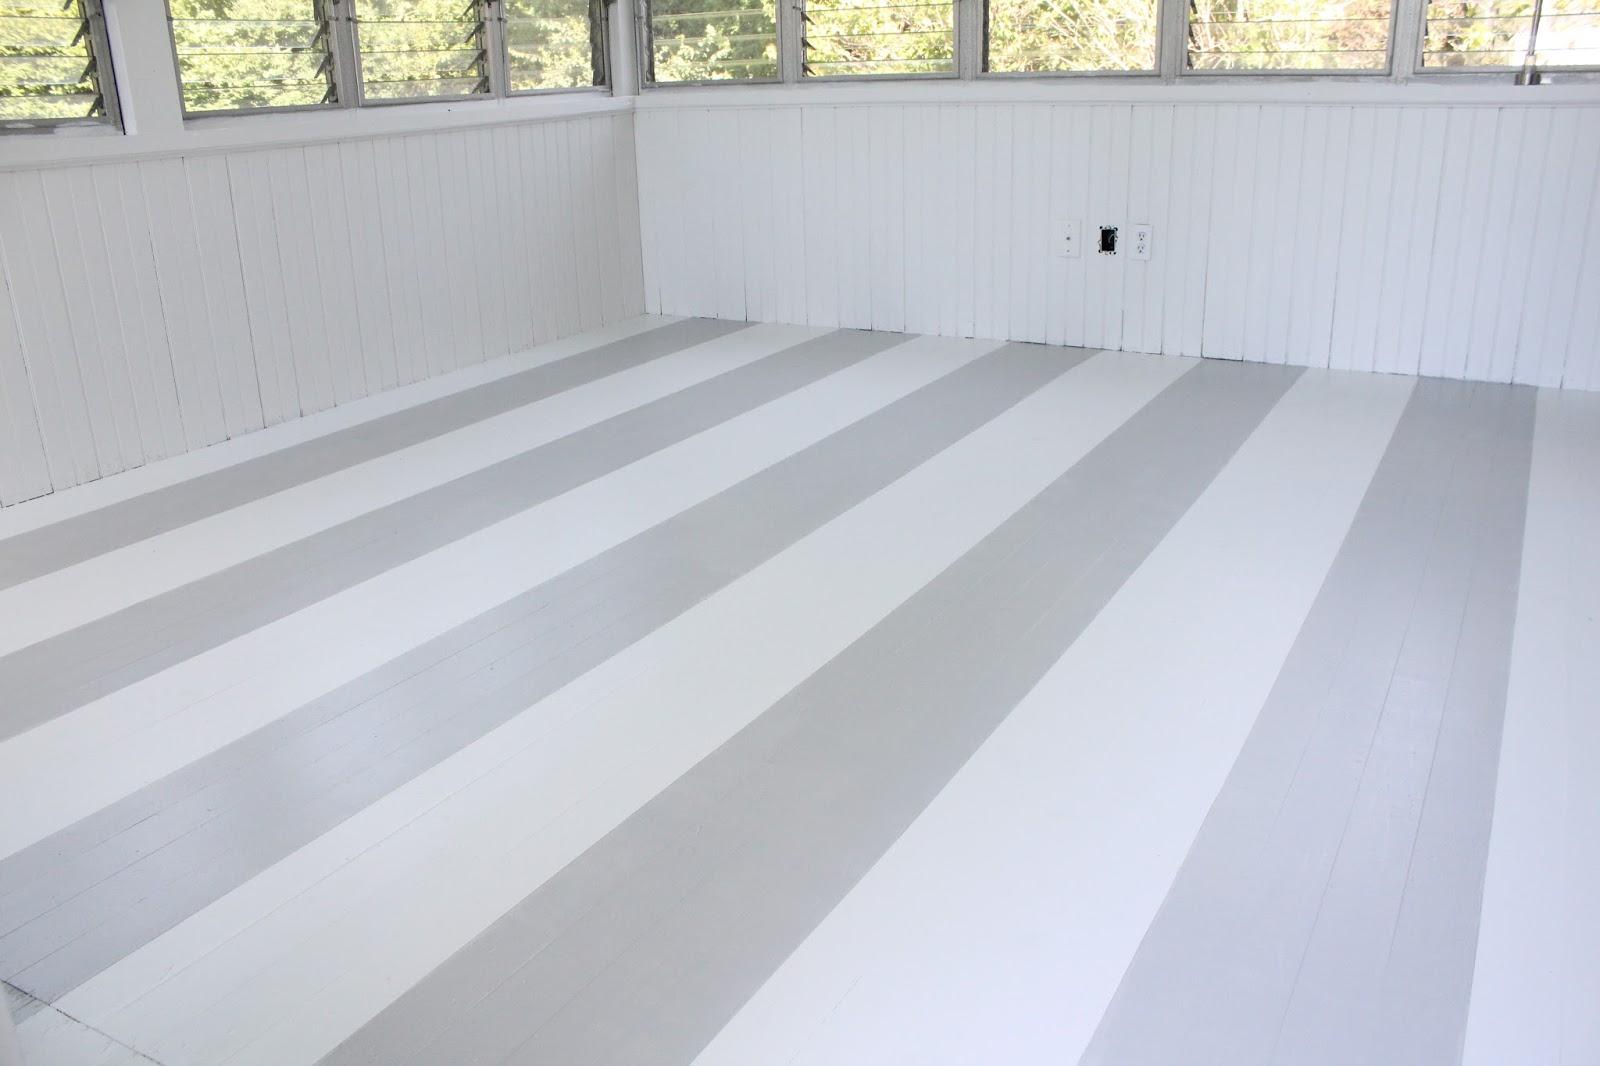 What is a floorify rigid vinyl floor